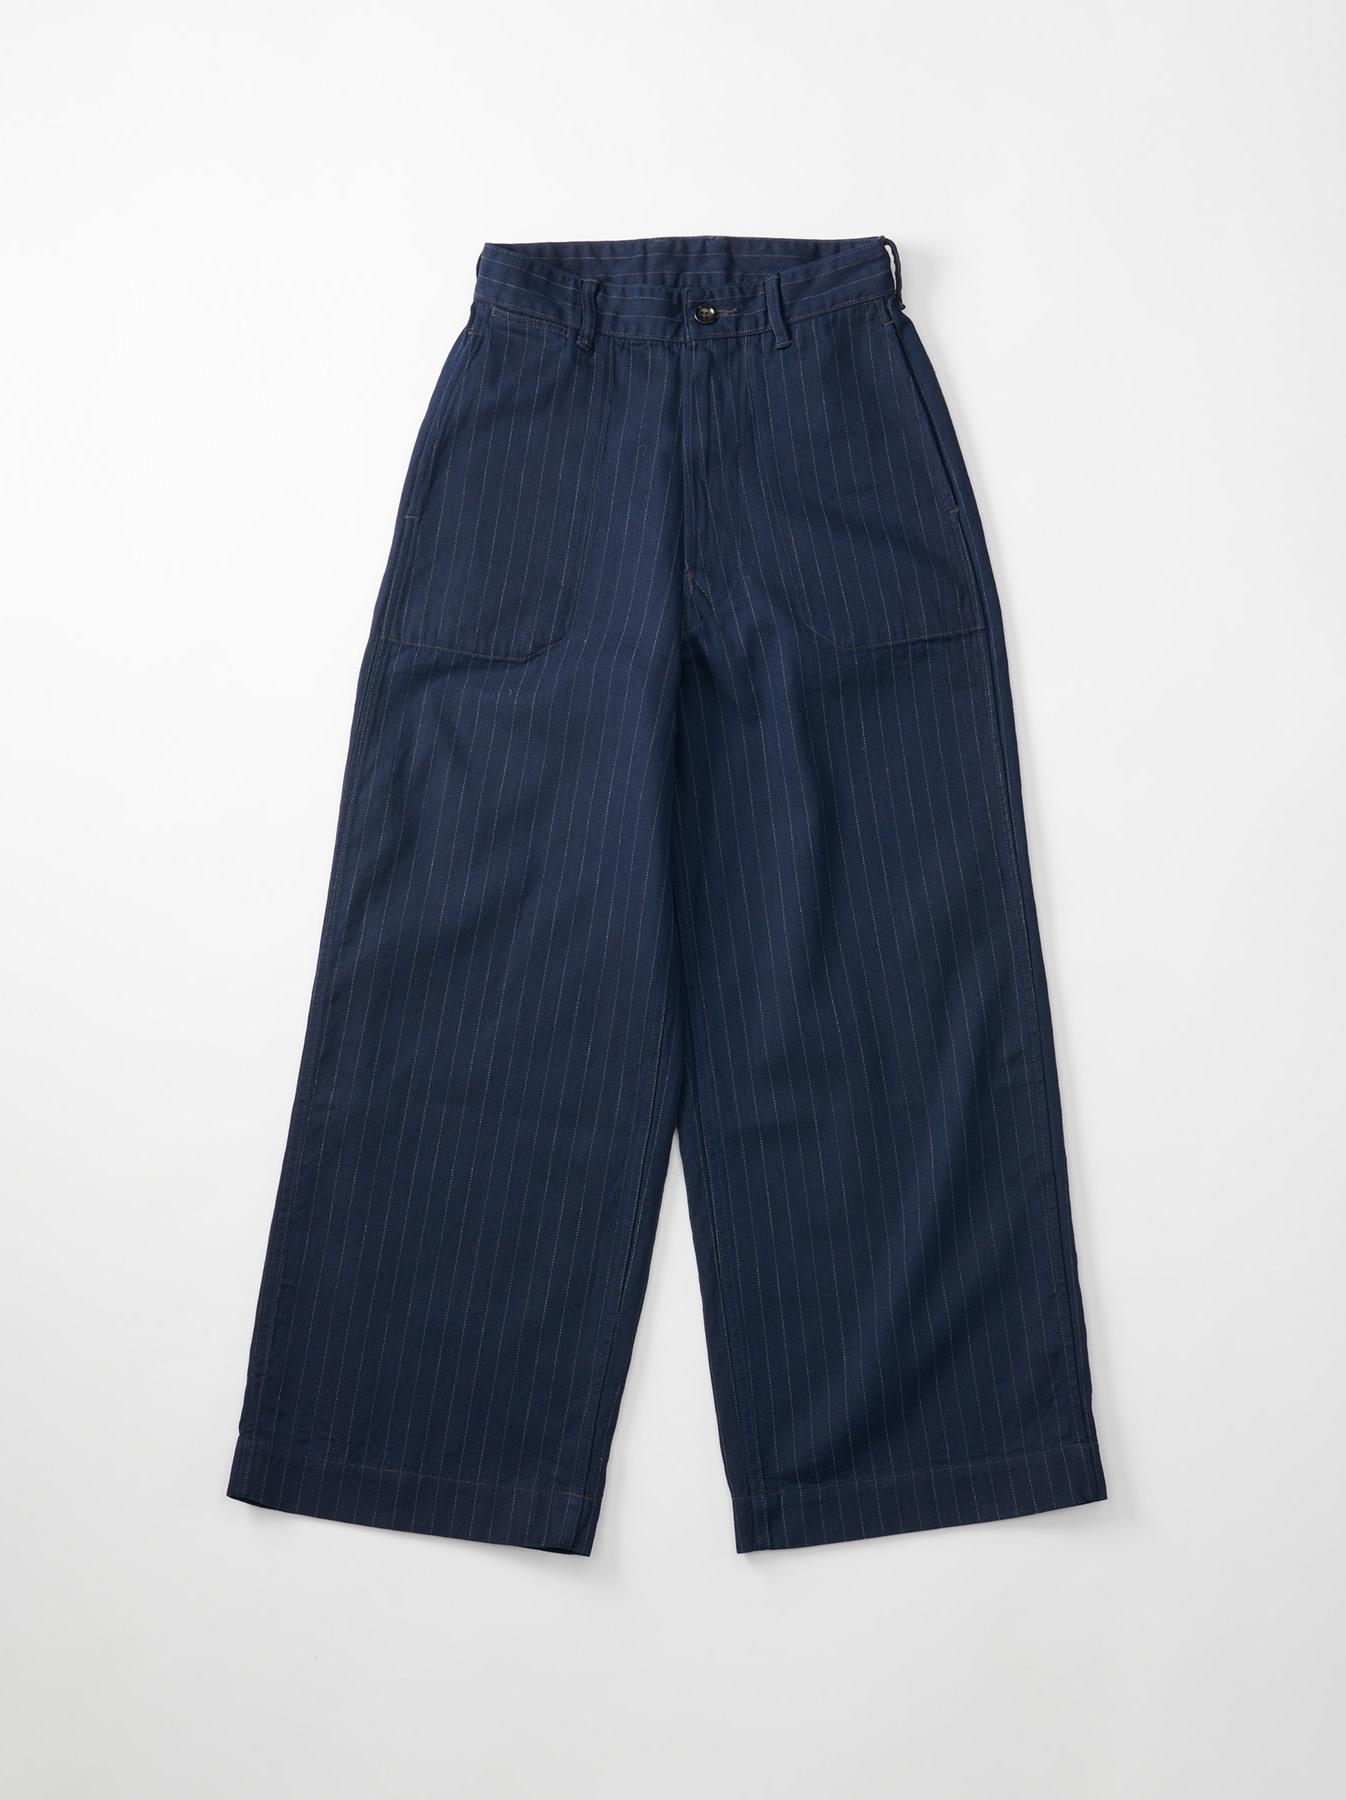 WH Kachin Hickory 908 Working Pants-1